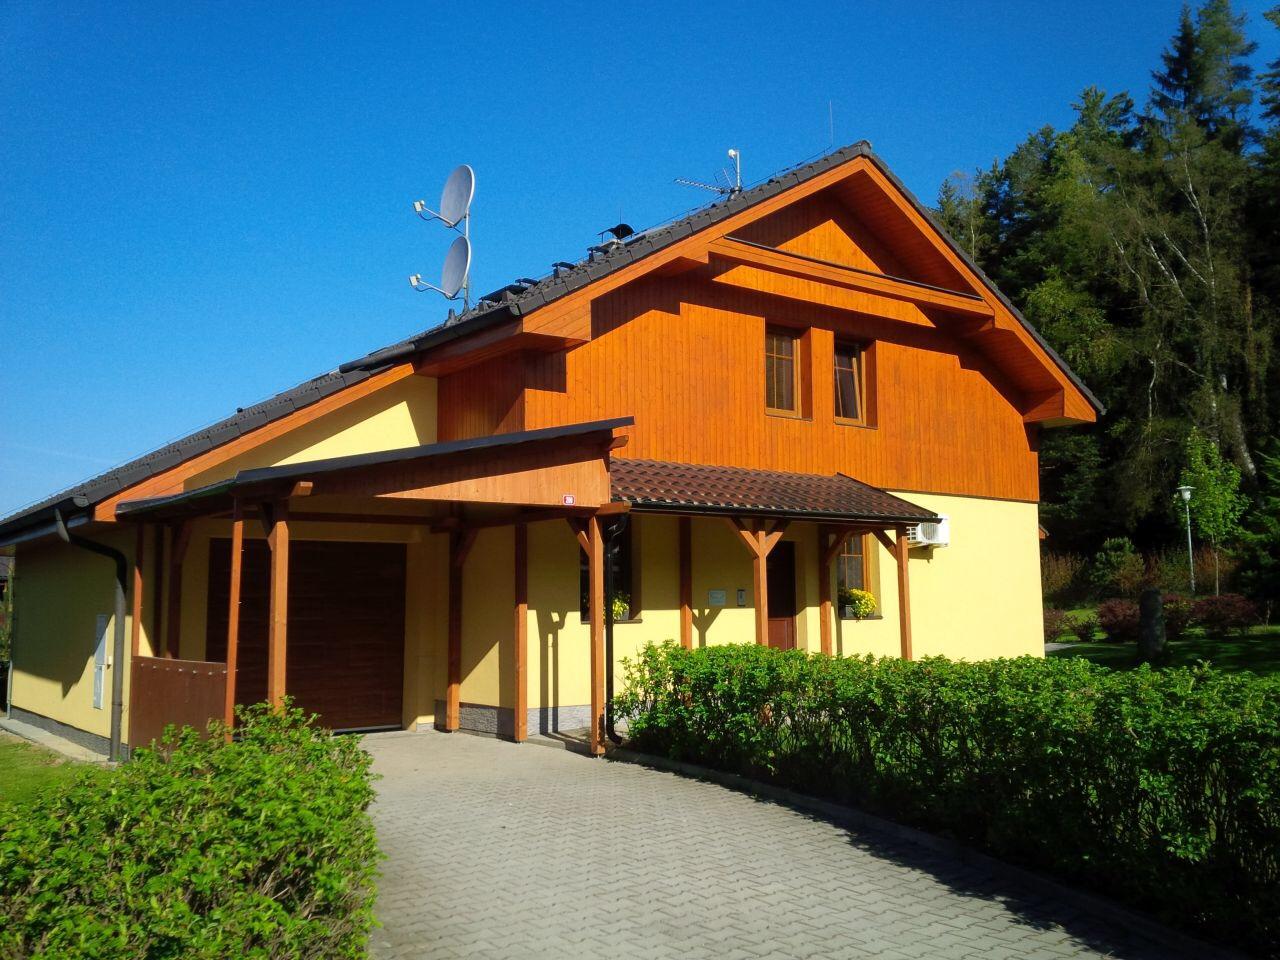 Villa Lanovka ubytovani Lipno. Apartmany u lesa.